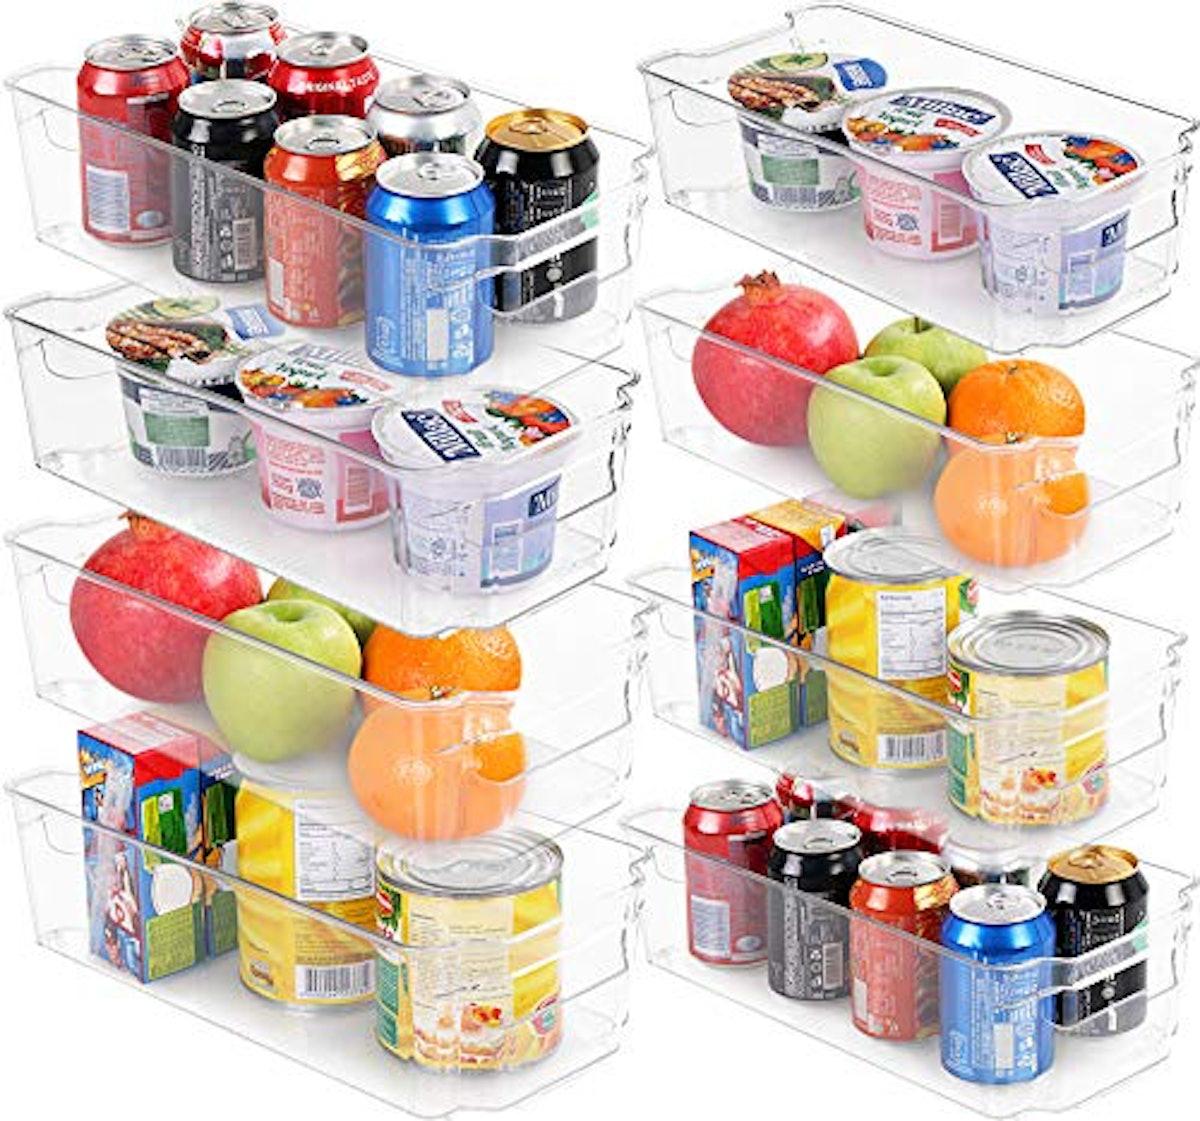 Set of 8 Refrigerator Pantry Organizer